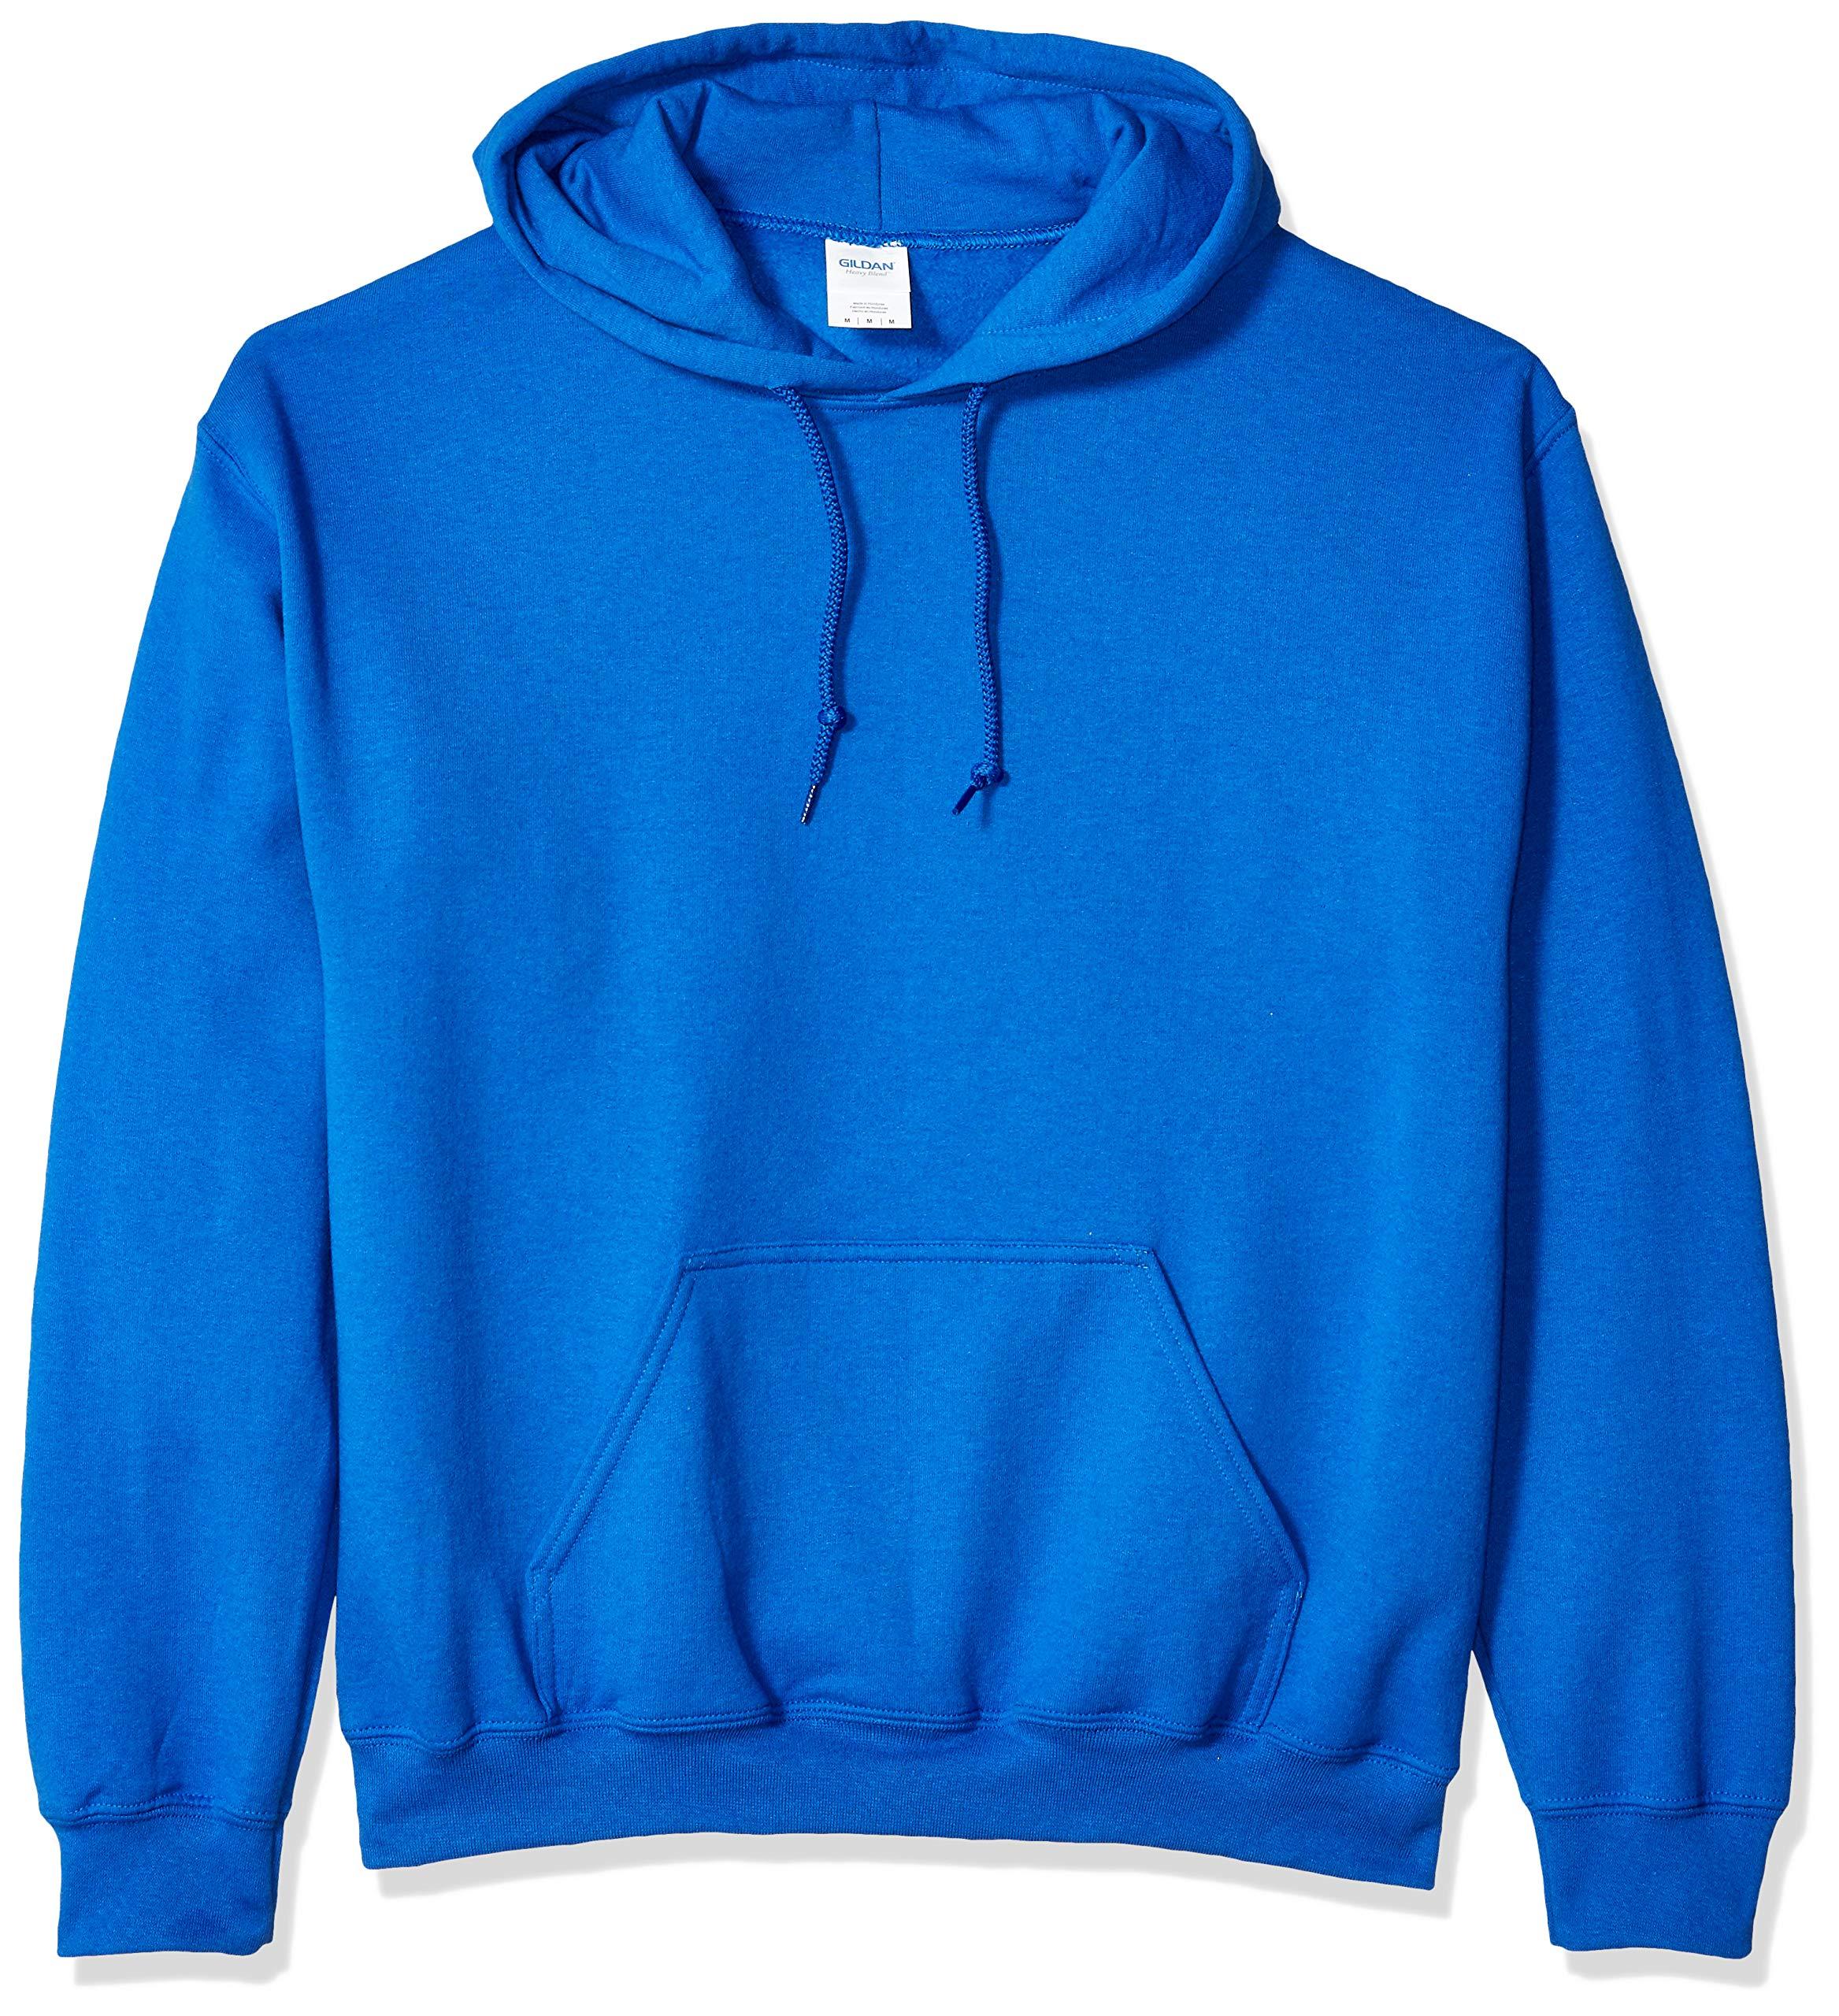 Gildan Men's Heavy Blend Fleece Hooded Sweatshirt G18500, Royal, Small